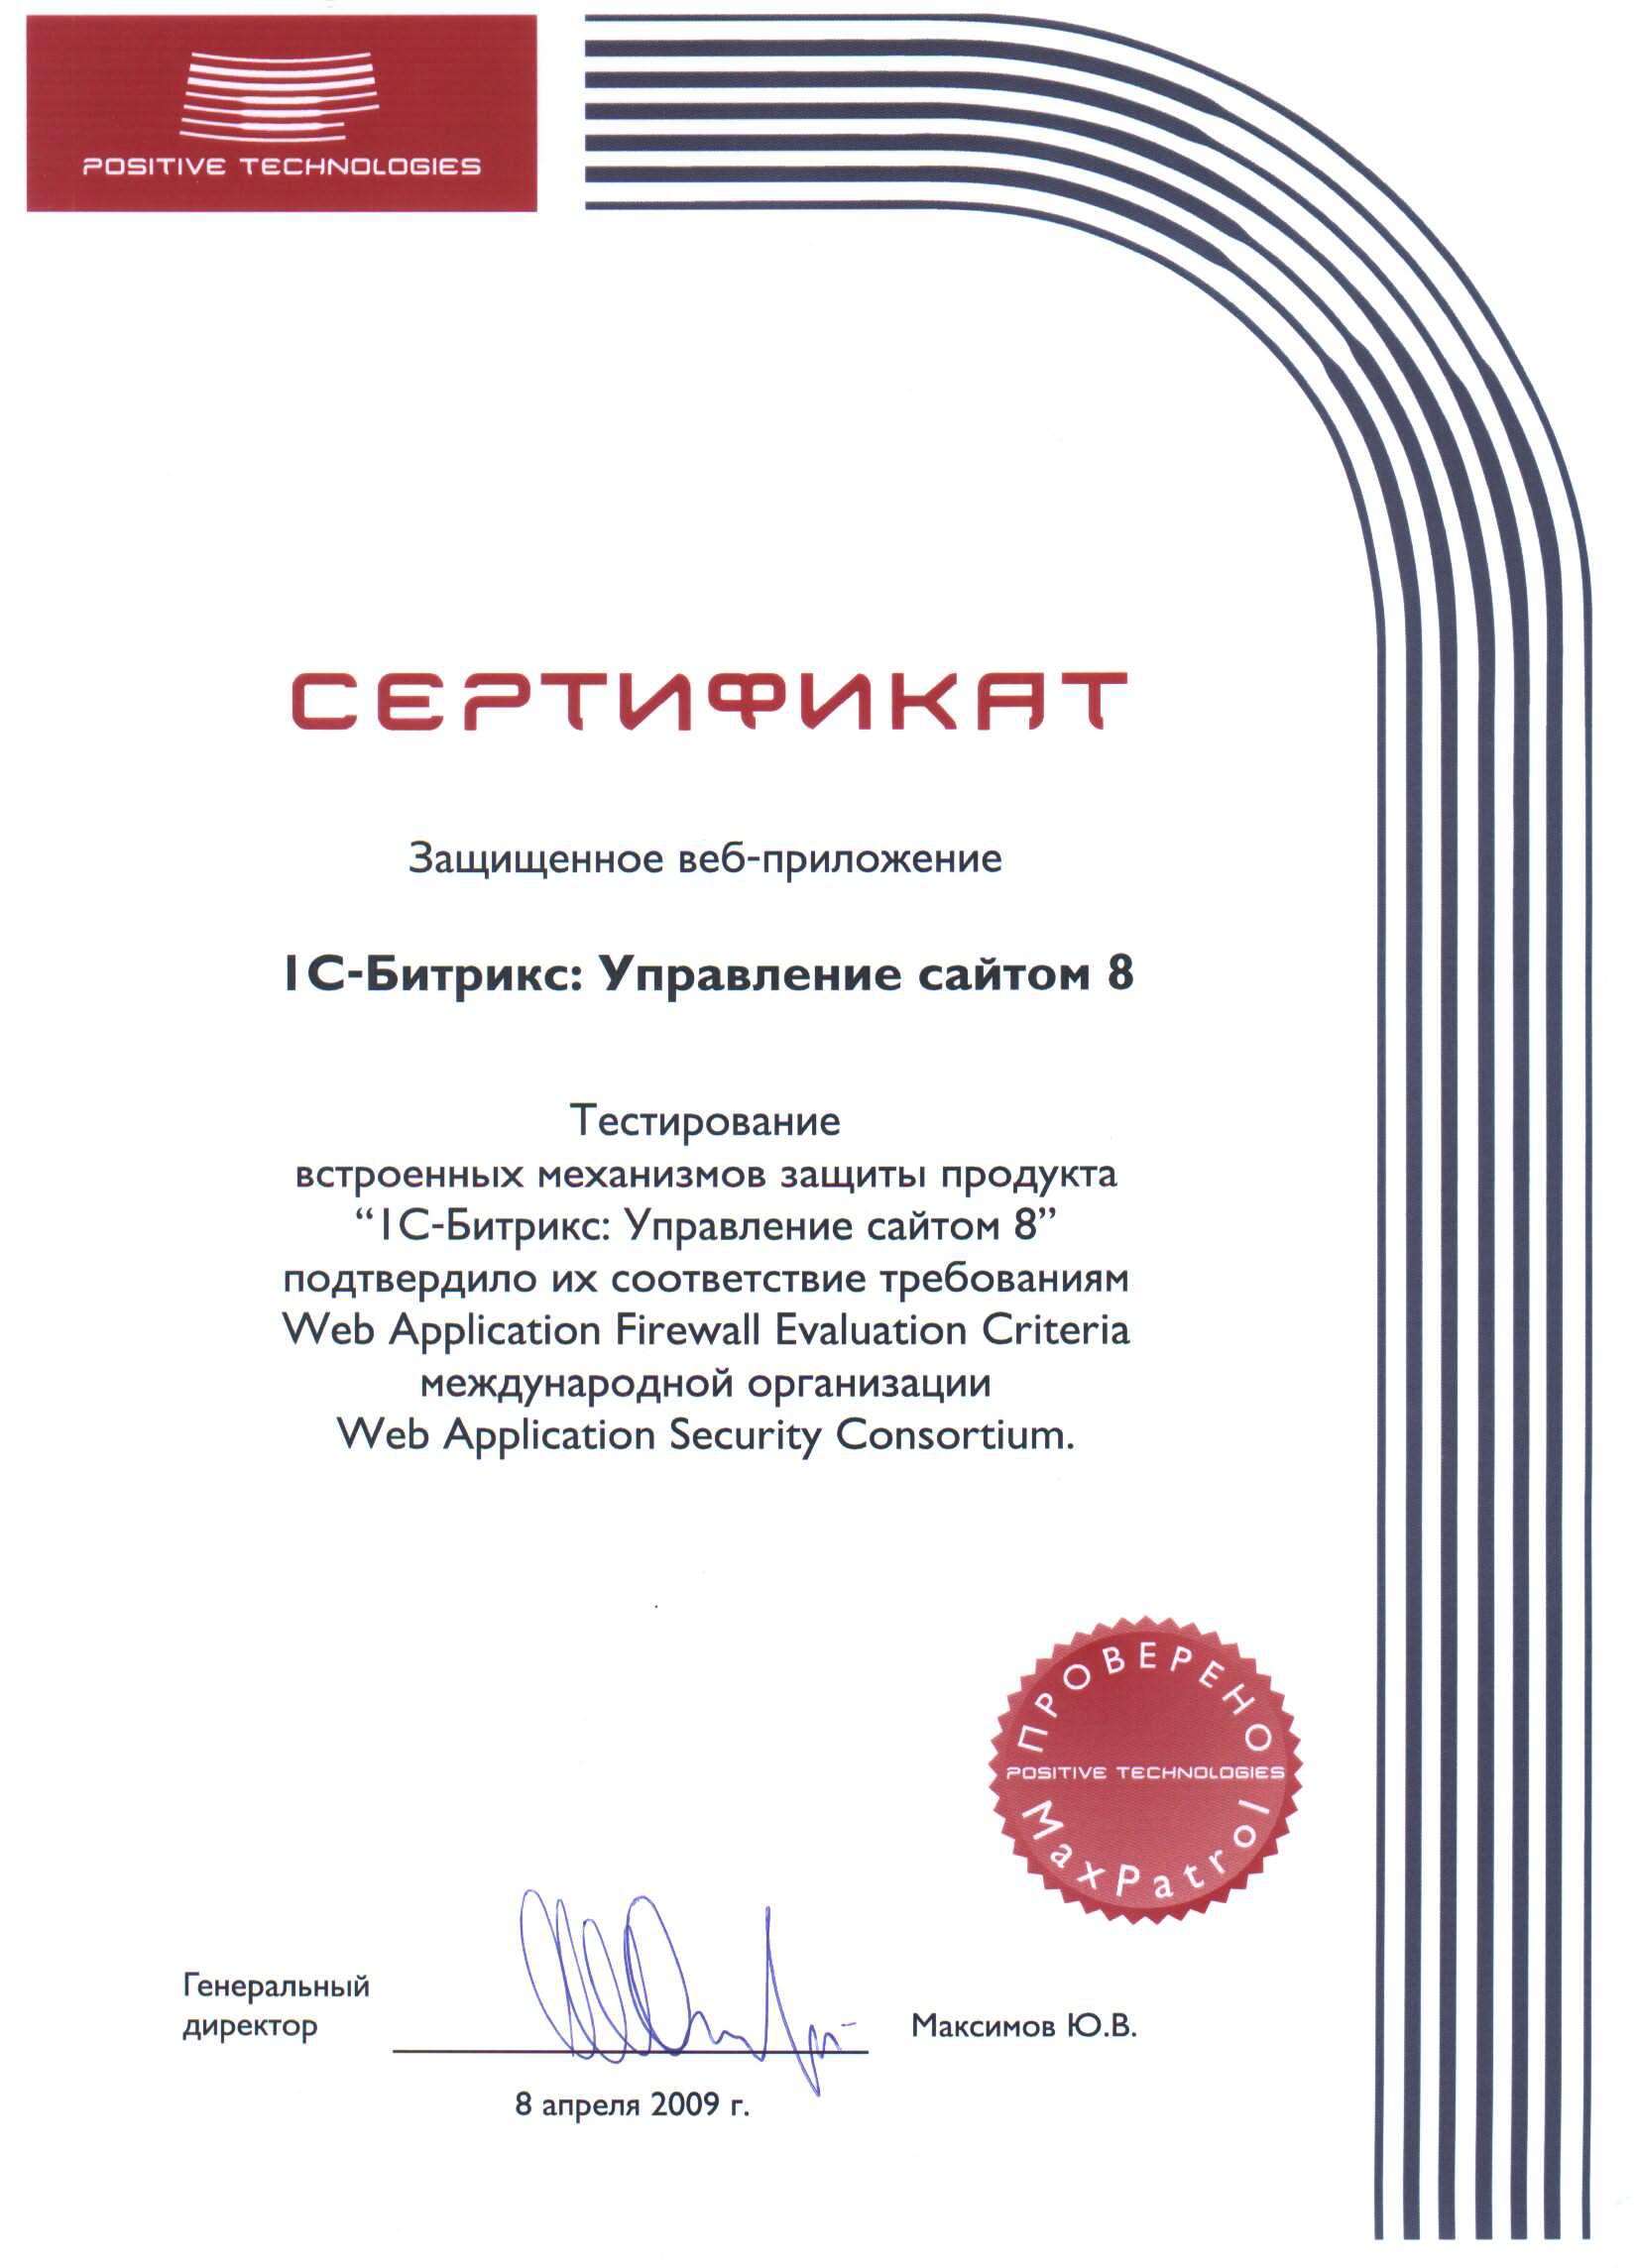 Сертификация 1С